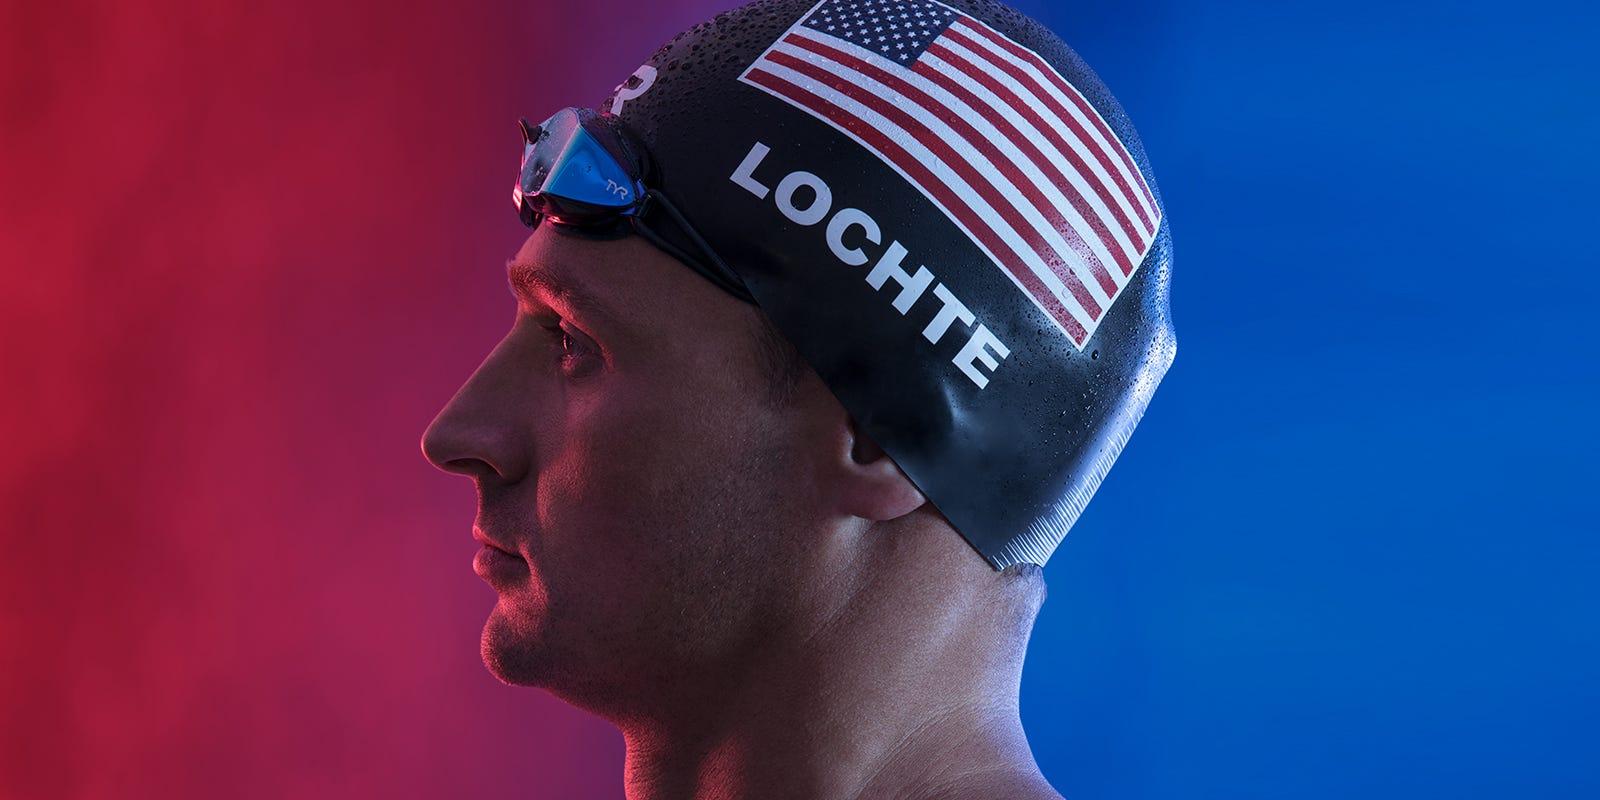 Team TYR Athletes - Ryan Lochte